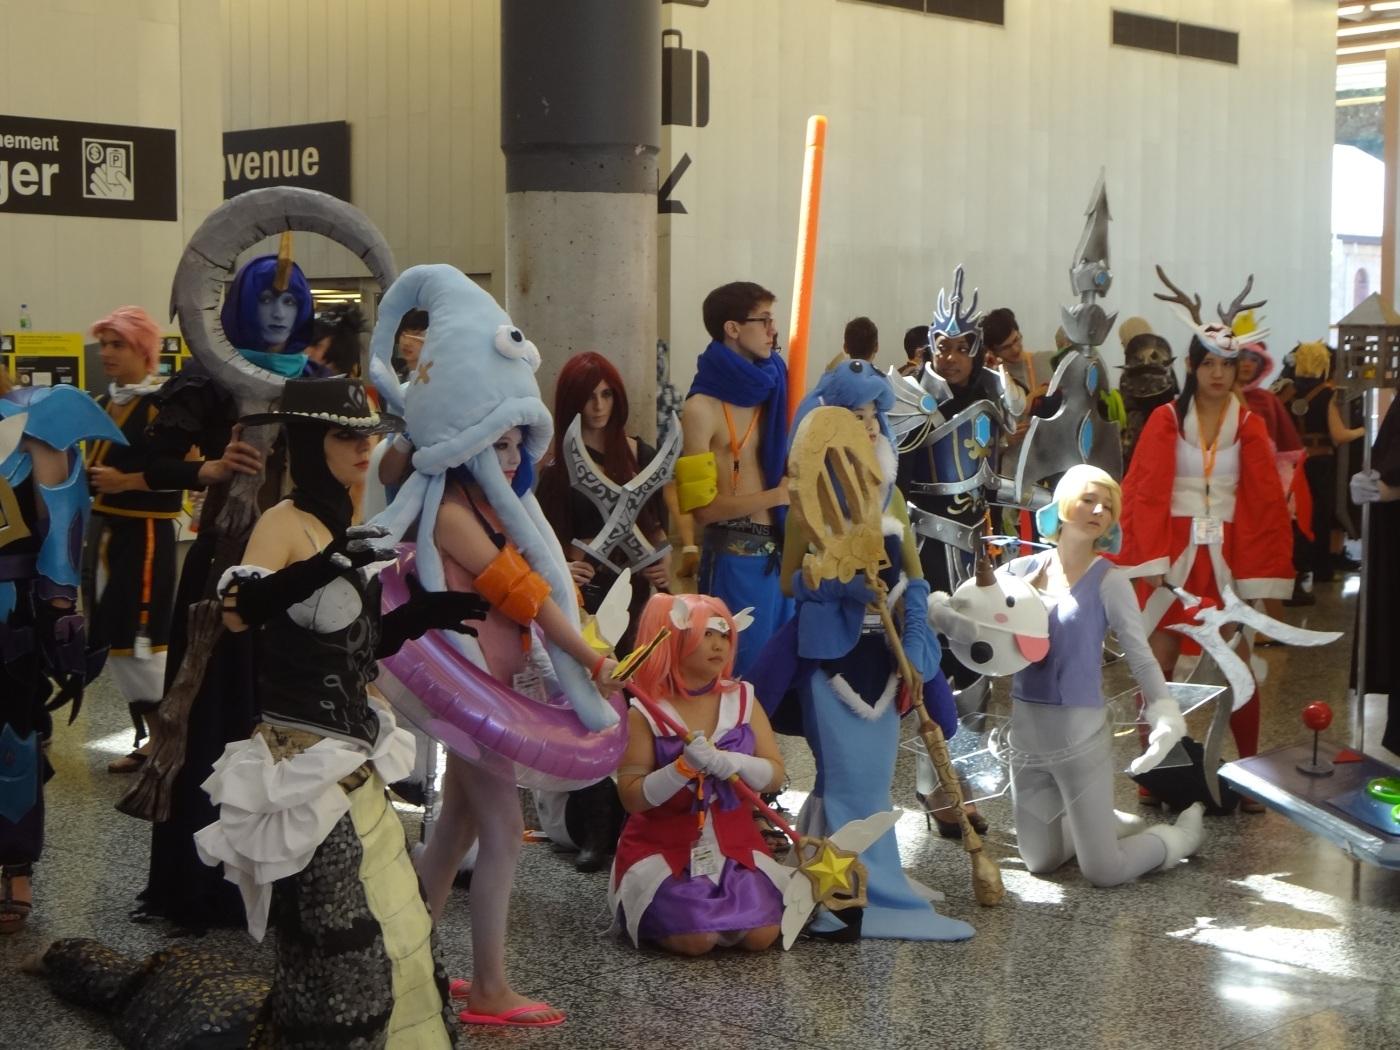 cosplay anime characters